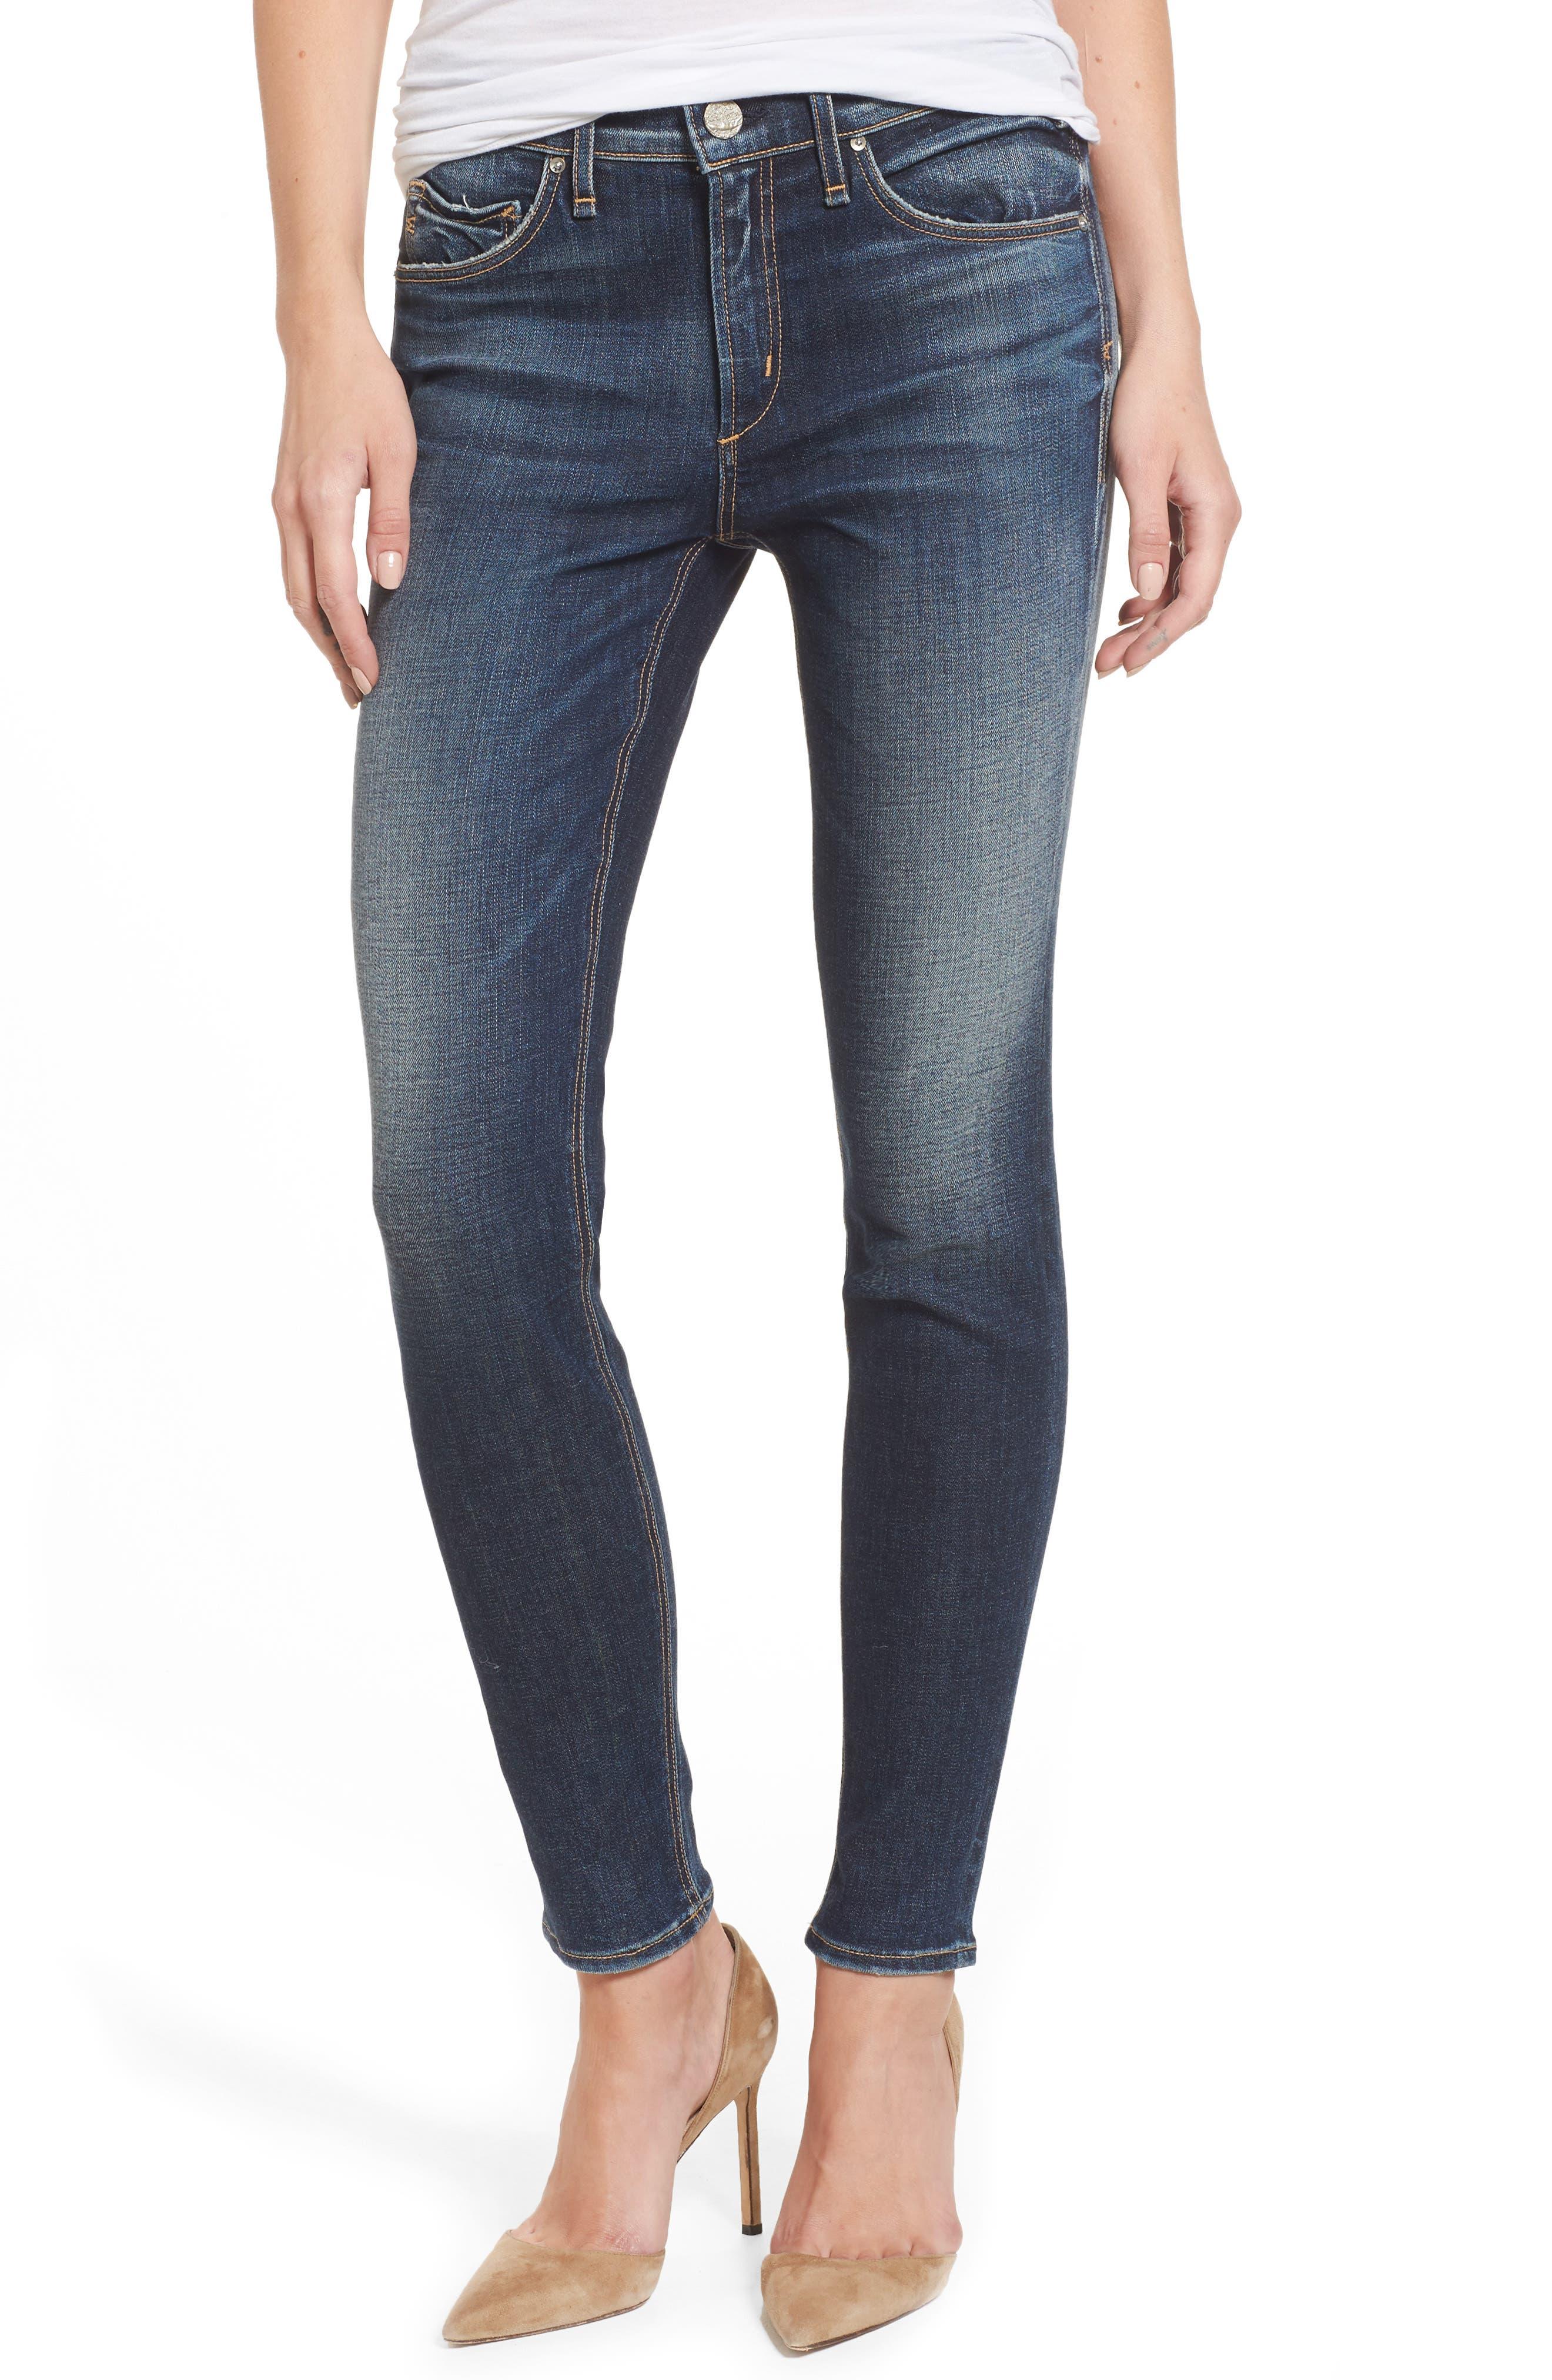 Newton High Waist Skinny Jeans,                         Main,                         color, 420